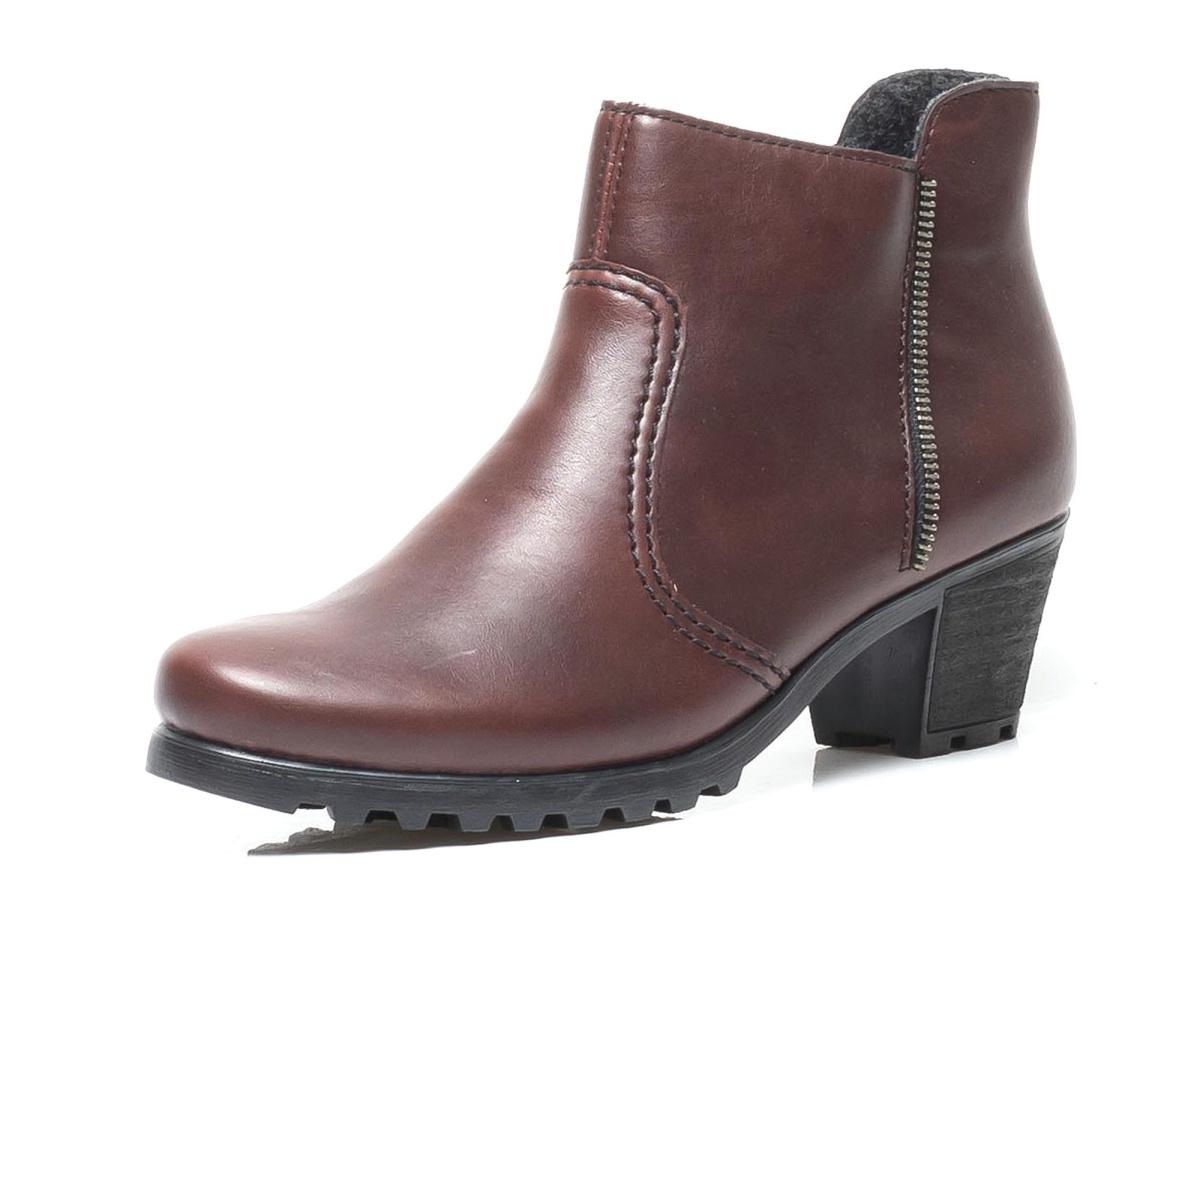 33fc61e5bf92 detail Dámska obuv RIEKER br Y8070 36 ROT ...